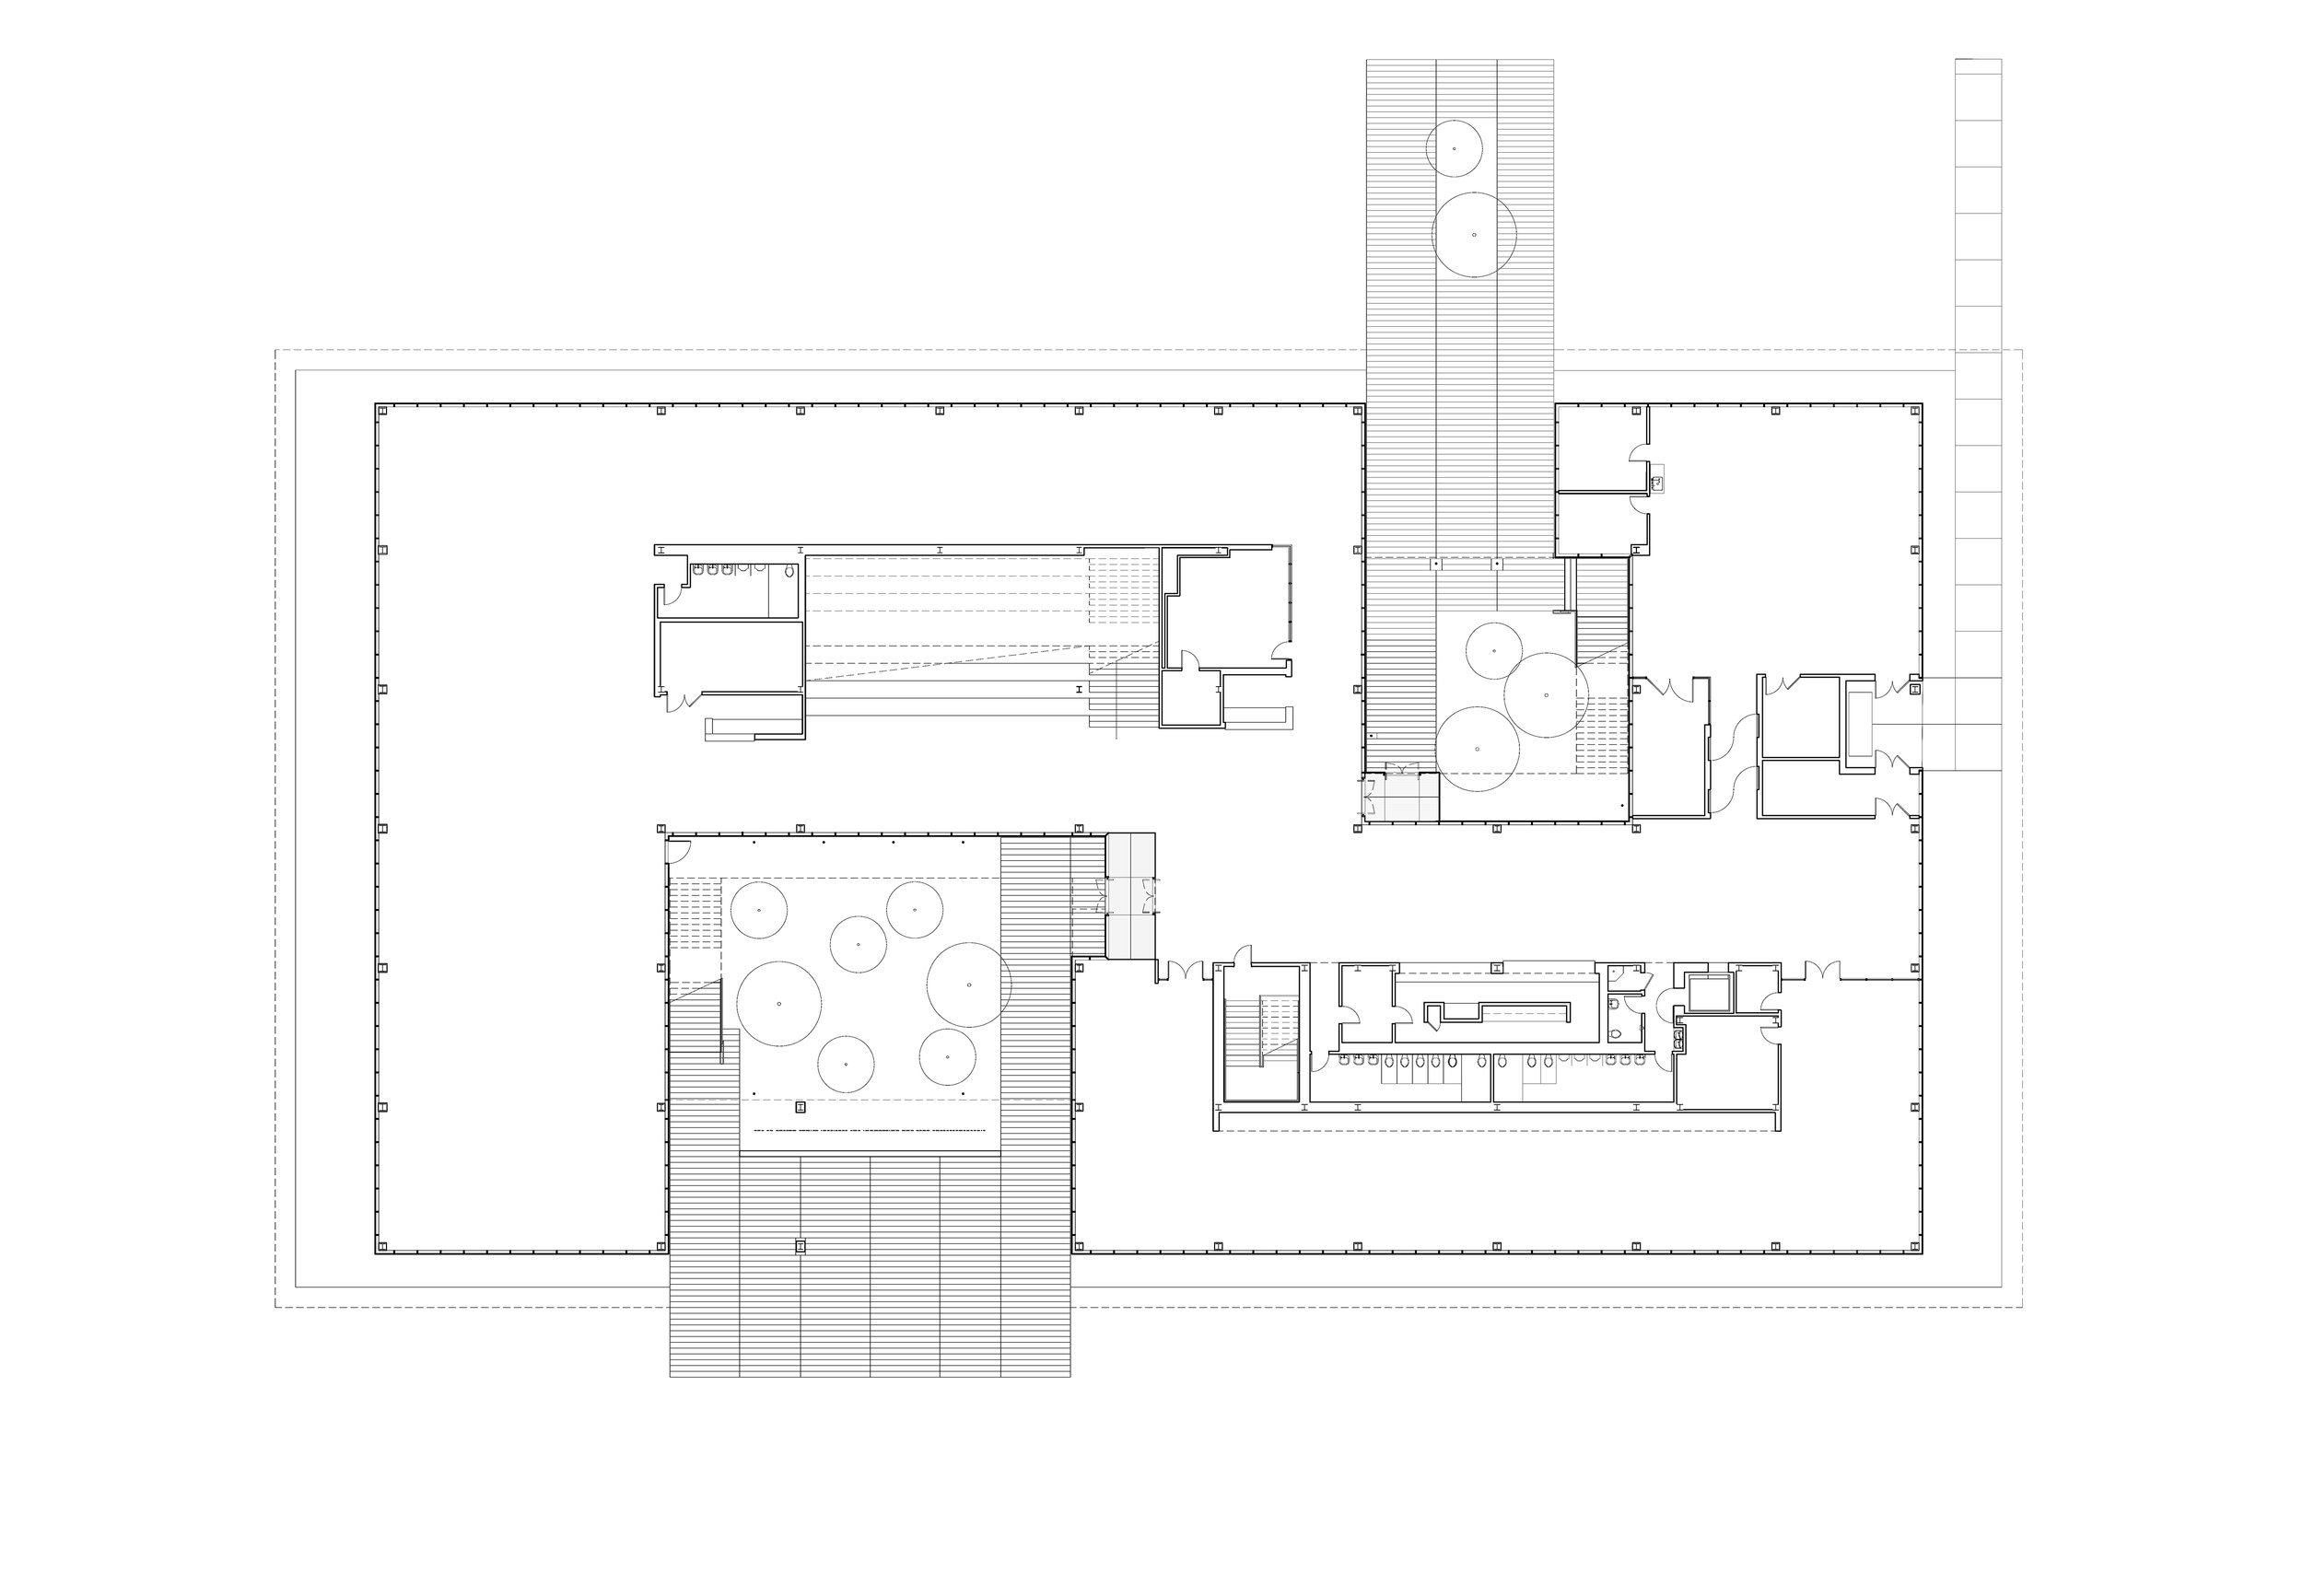 18_09.18 - IITIC - ground level plan.jpg